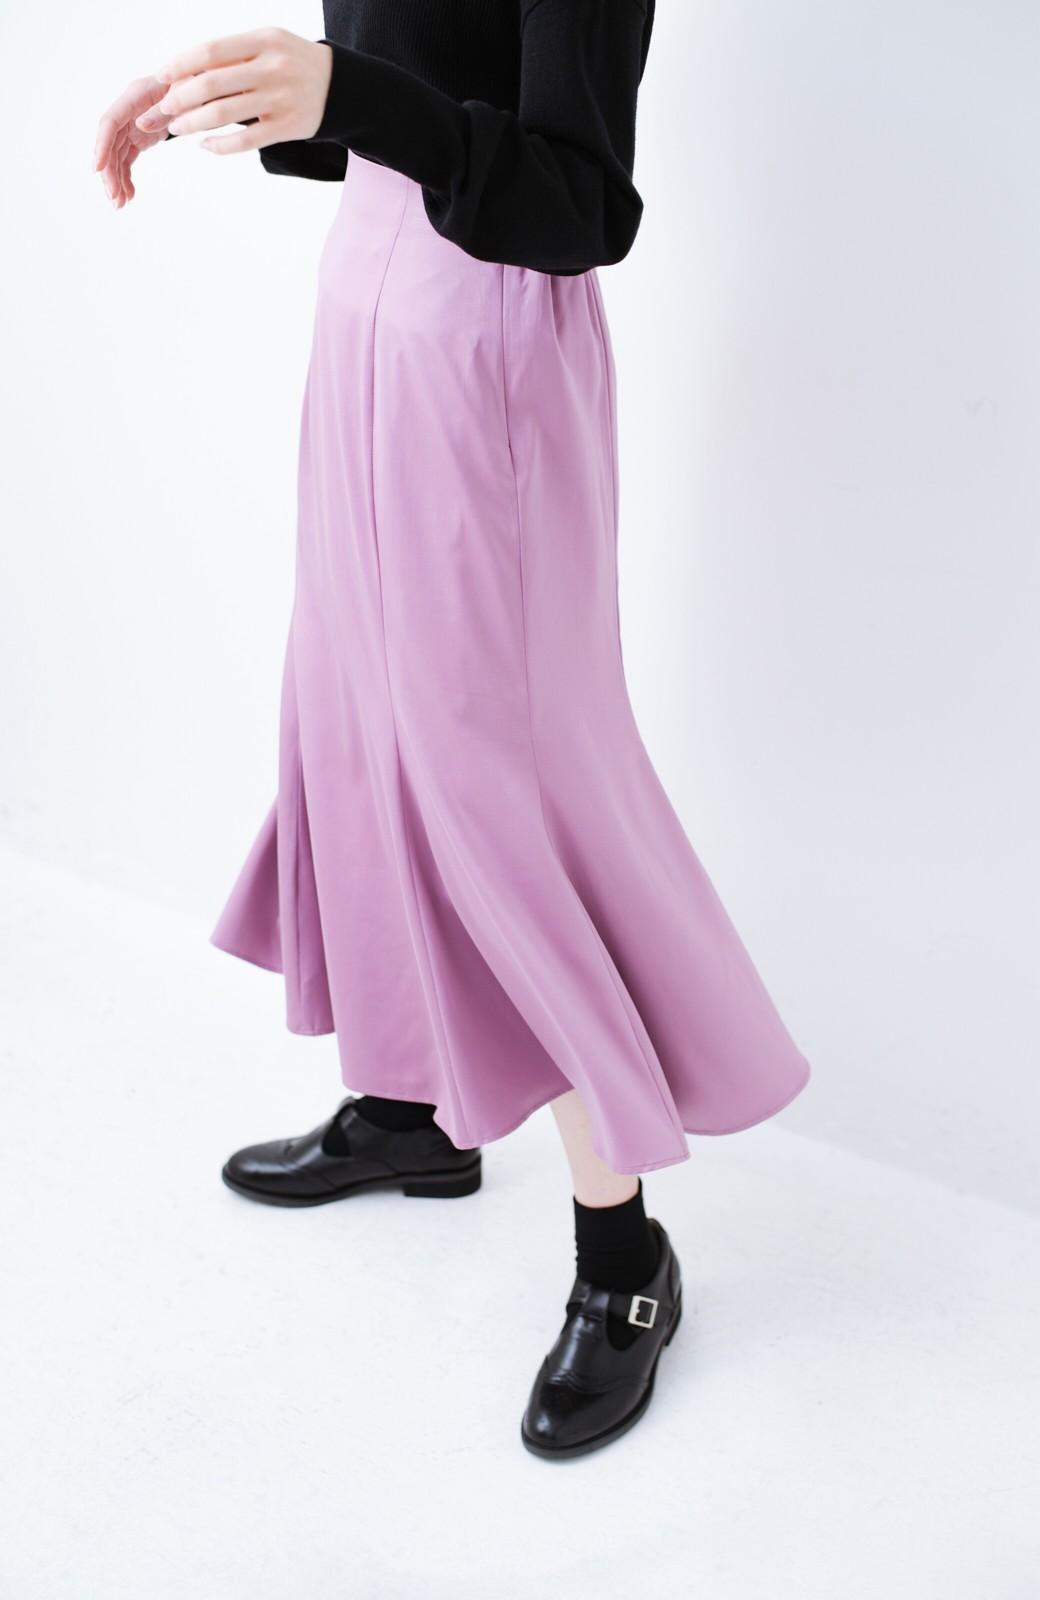 haco! スウェットやスニーカーを合わせても女っぽくいられるサテンマーメイドスカート by que made me <ピンク>の商品写真6